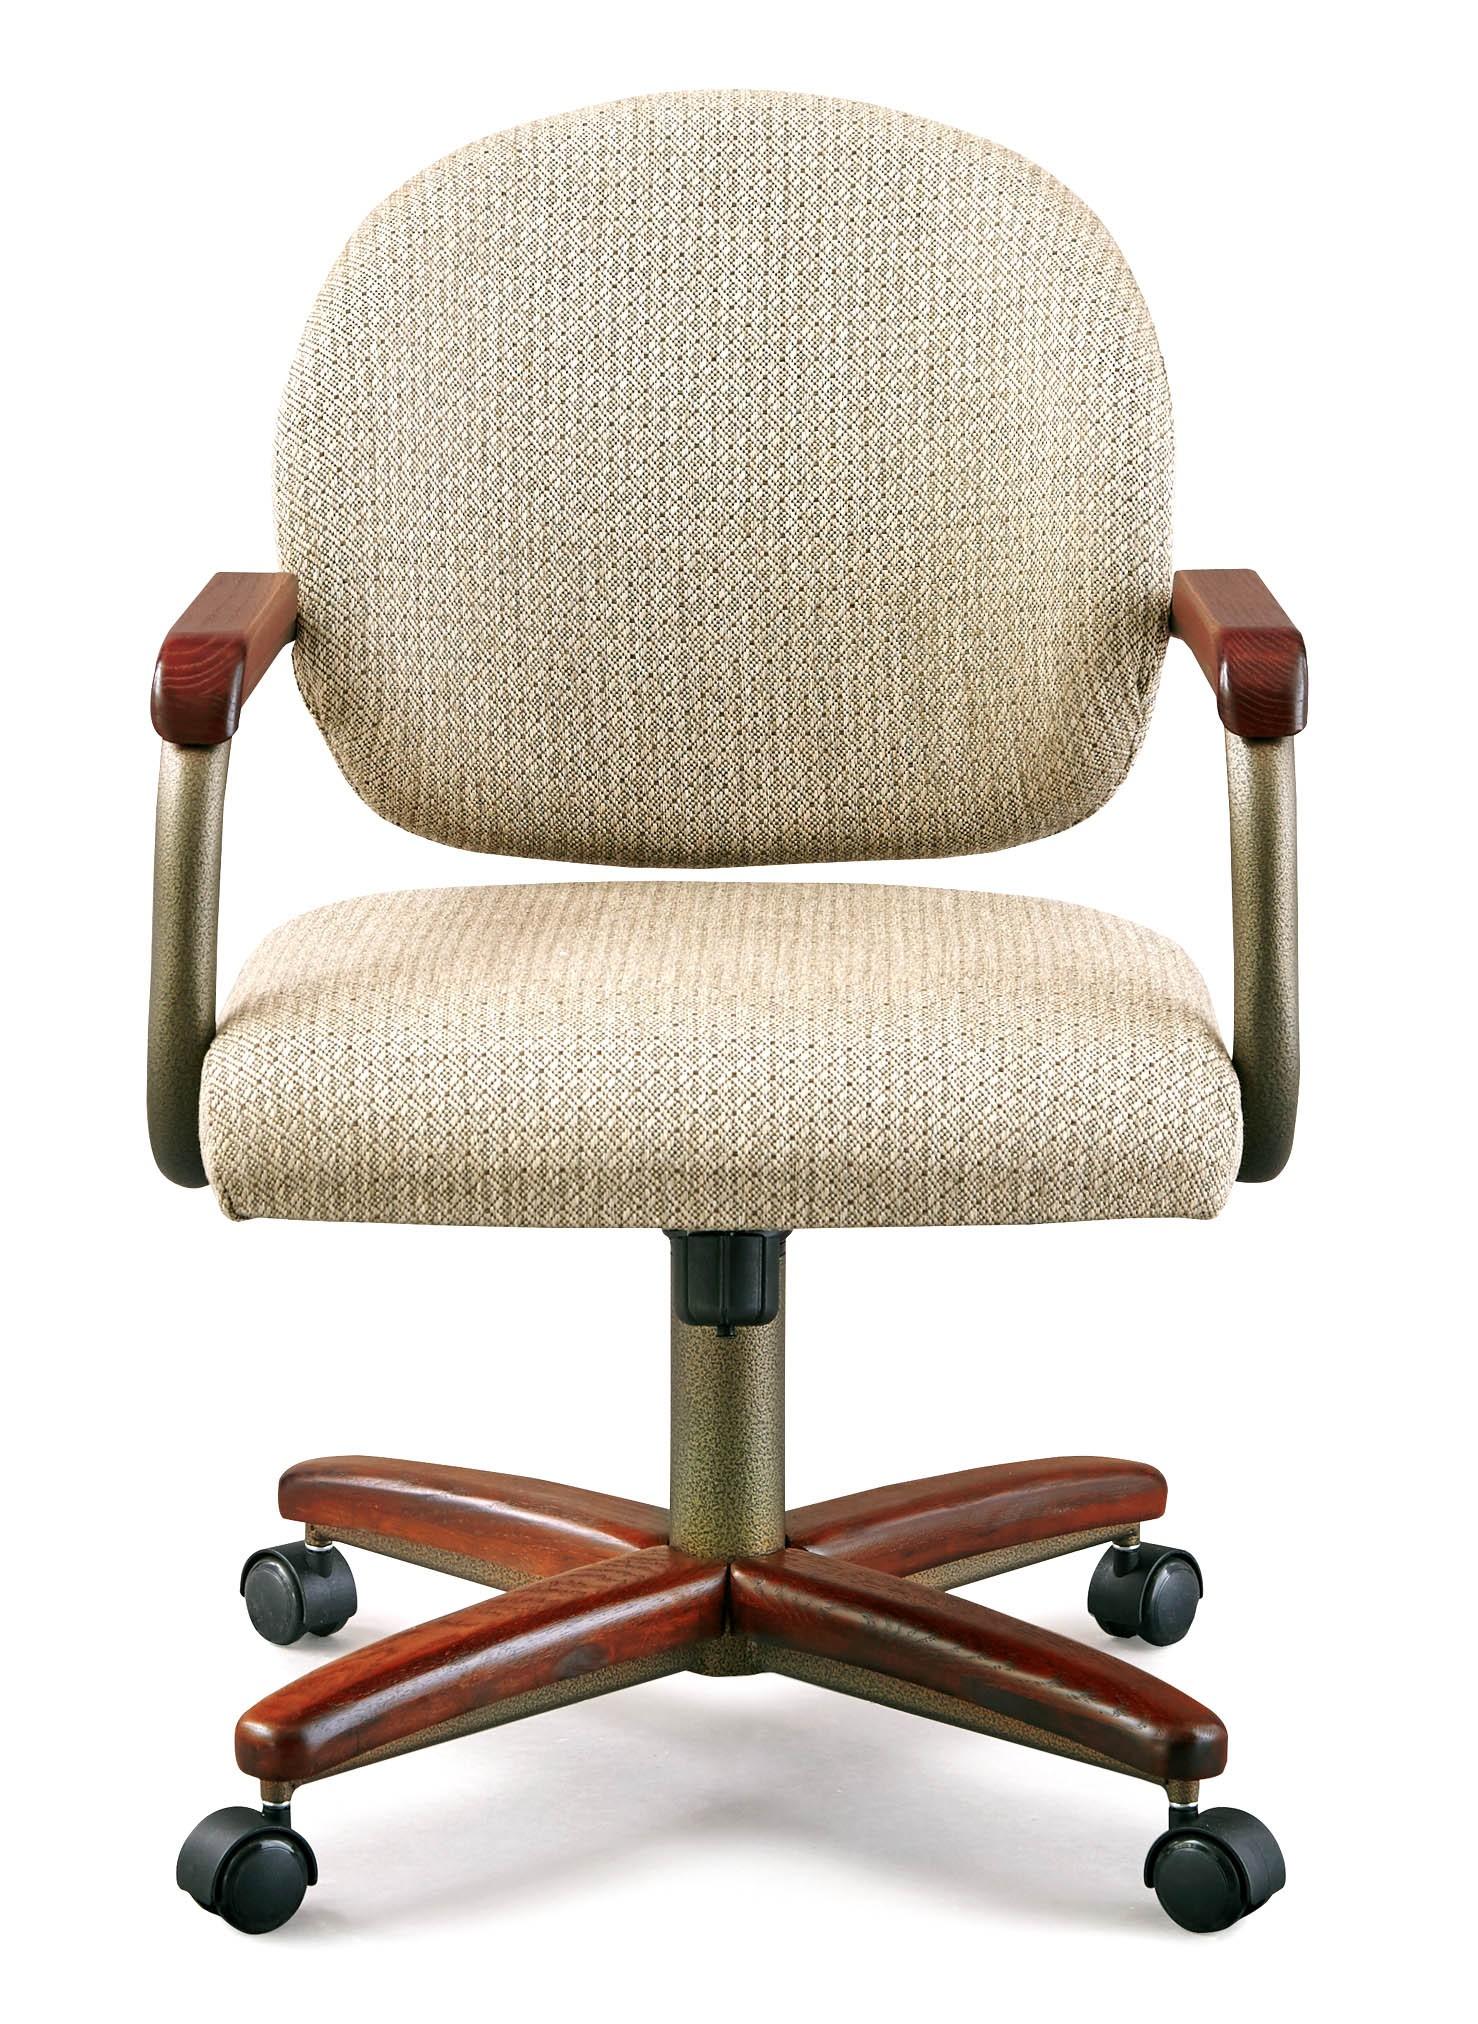 Chromcraft C362935 Swivel Caster Dinette Chair  Discount